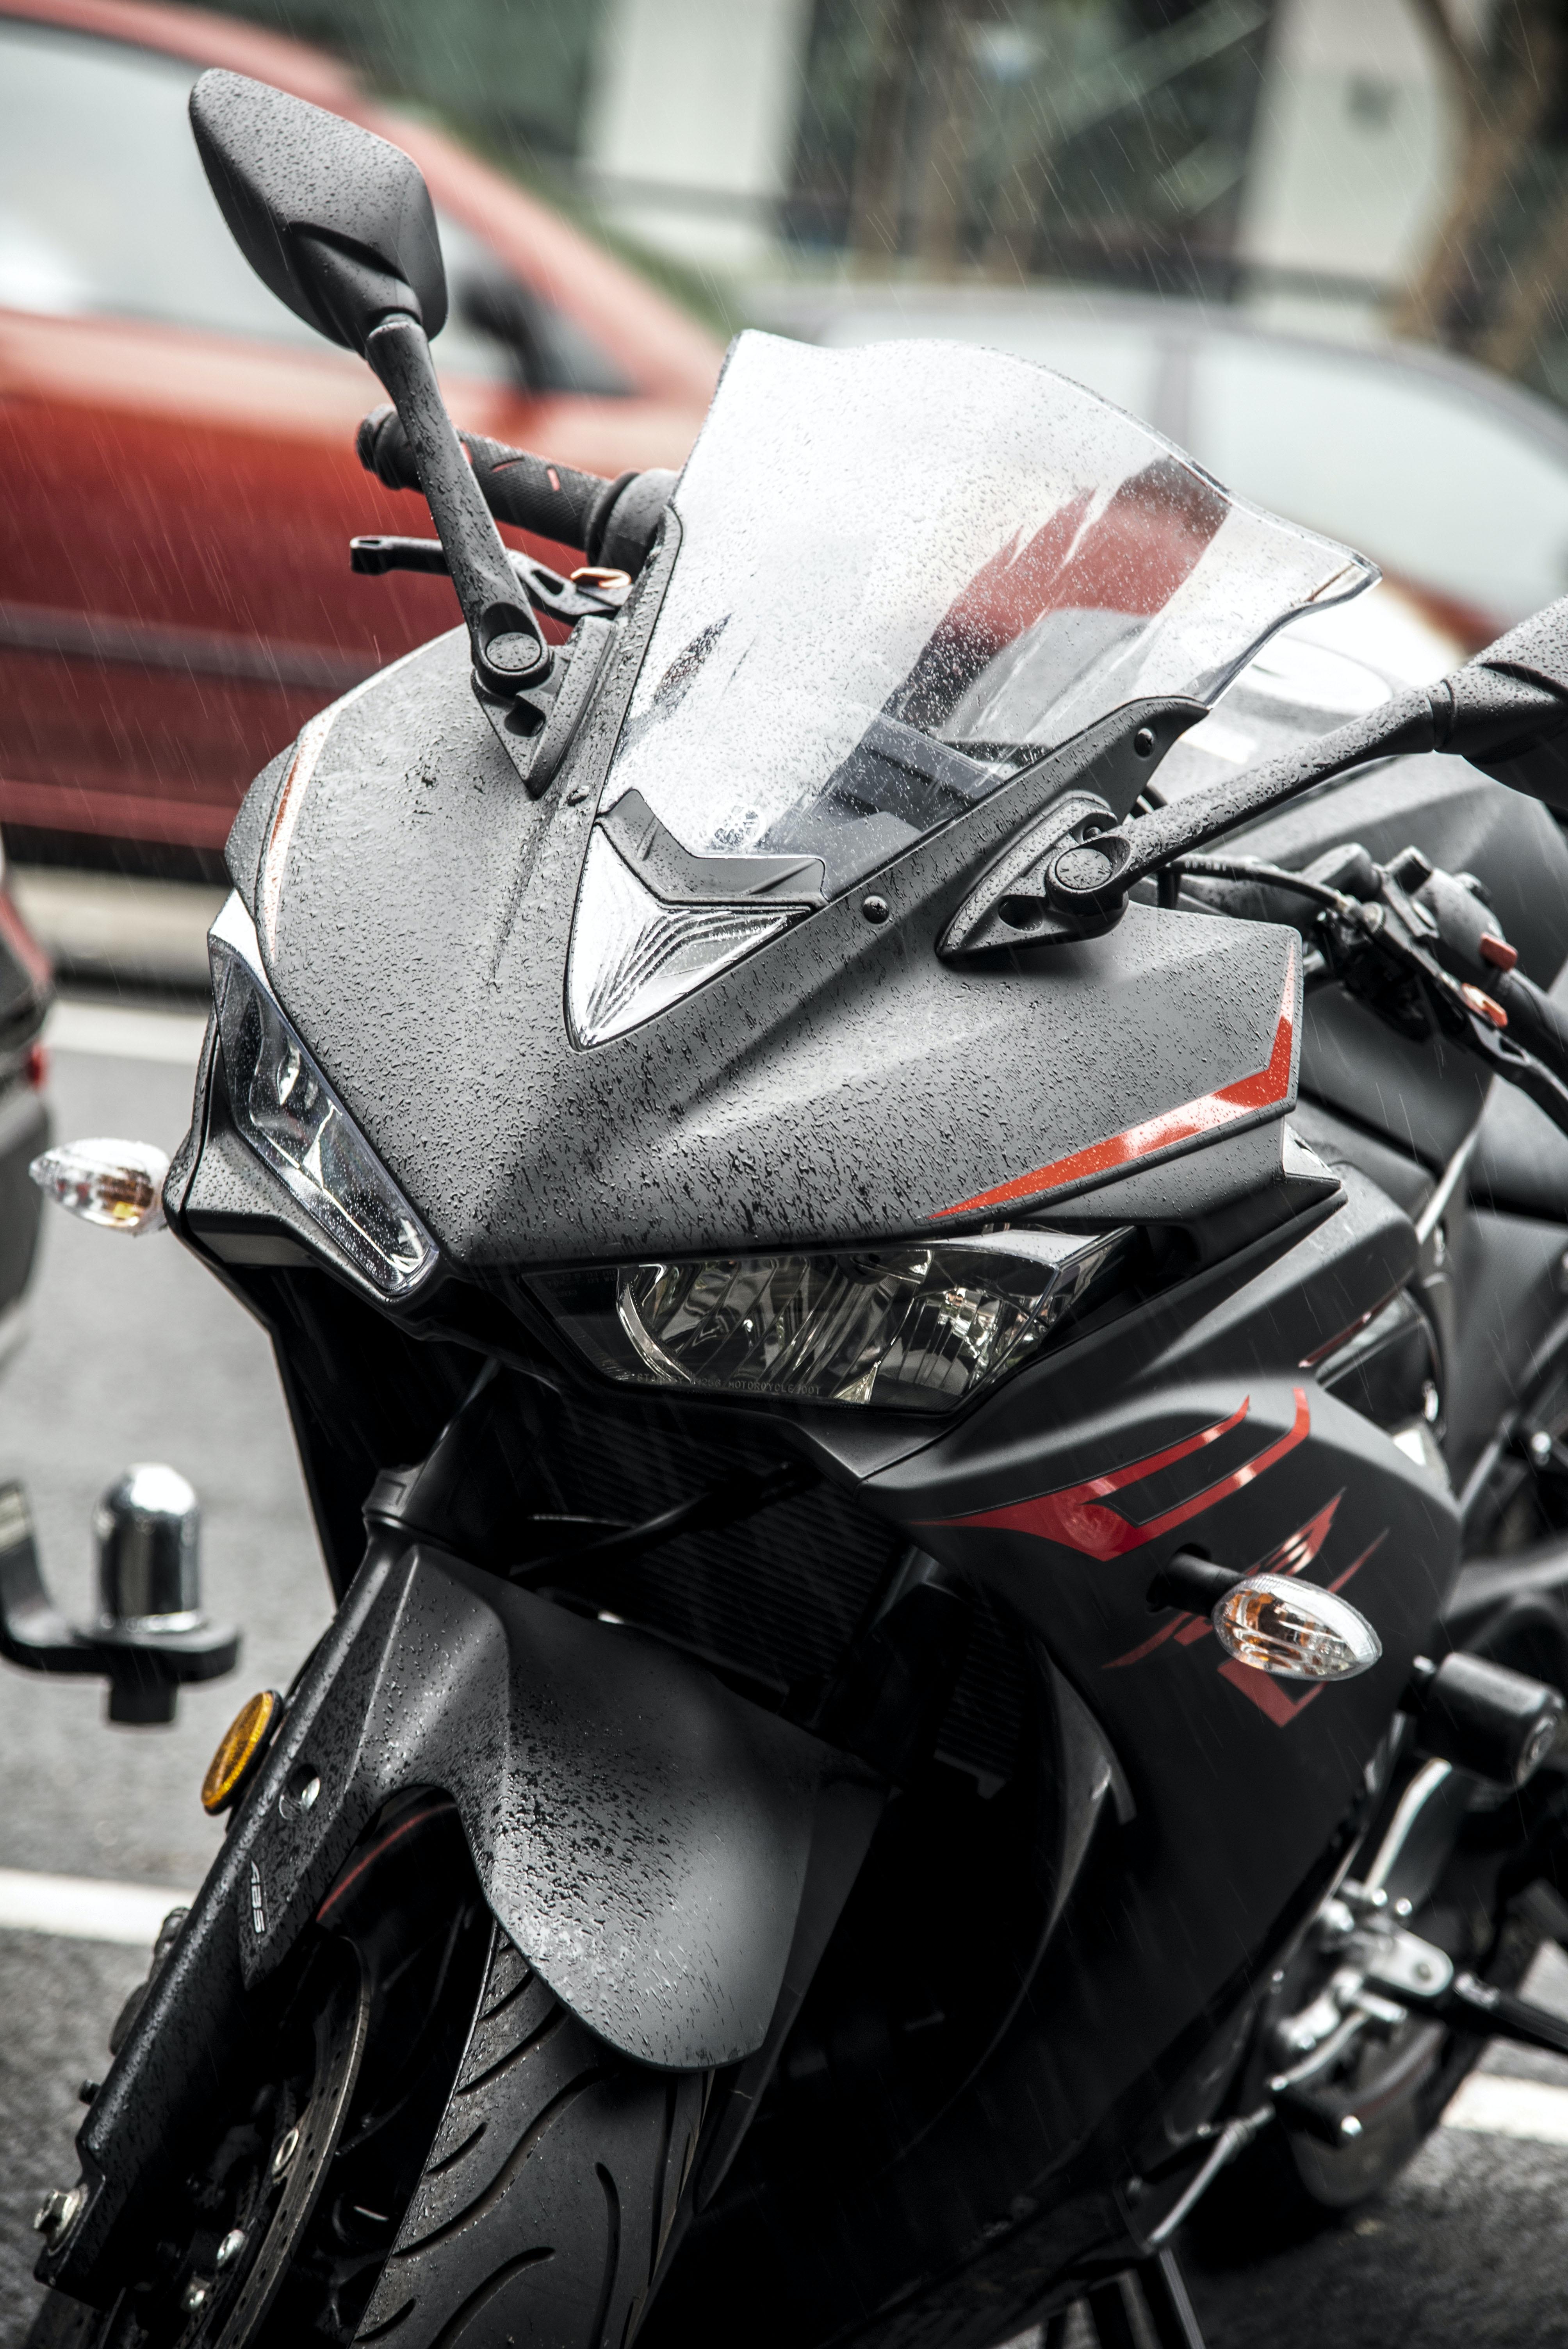 black and red Yamaha R1 sports bike near parked car